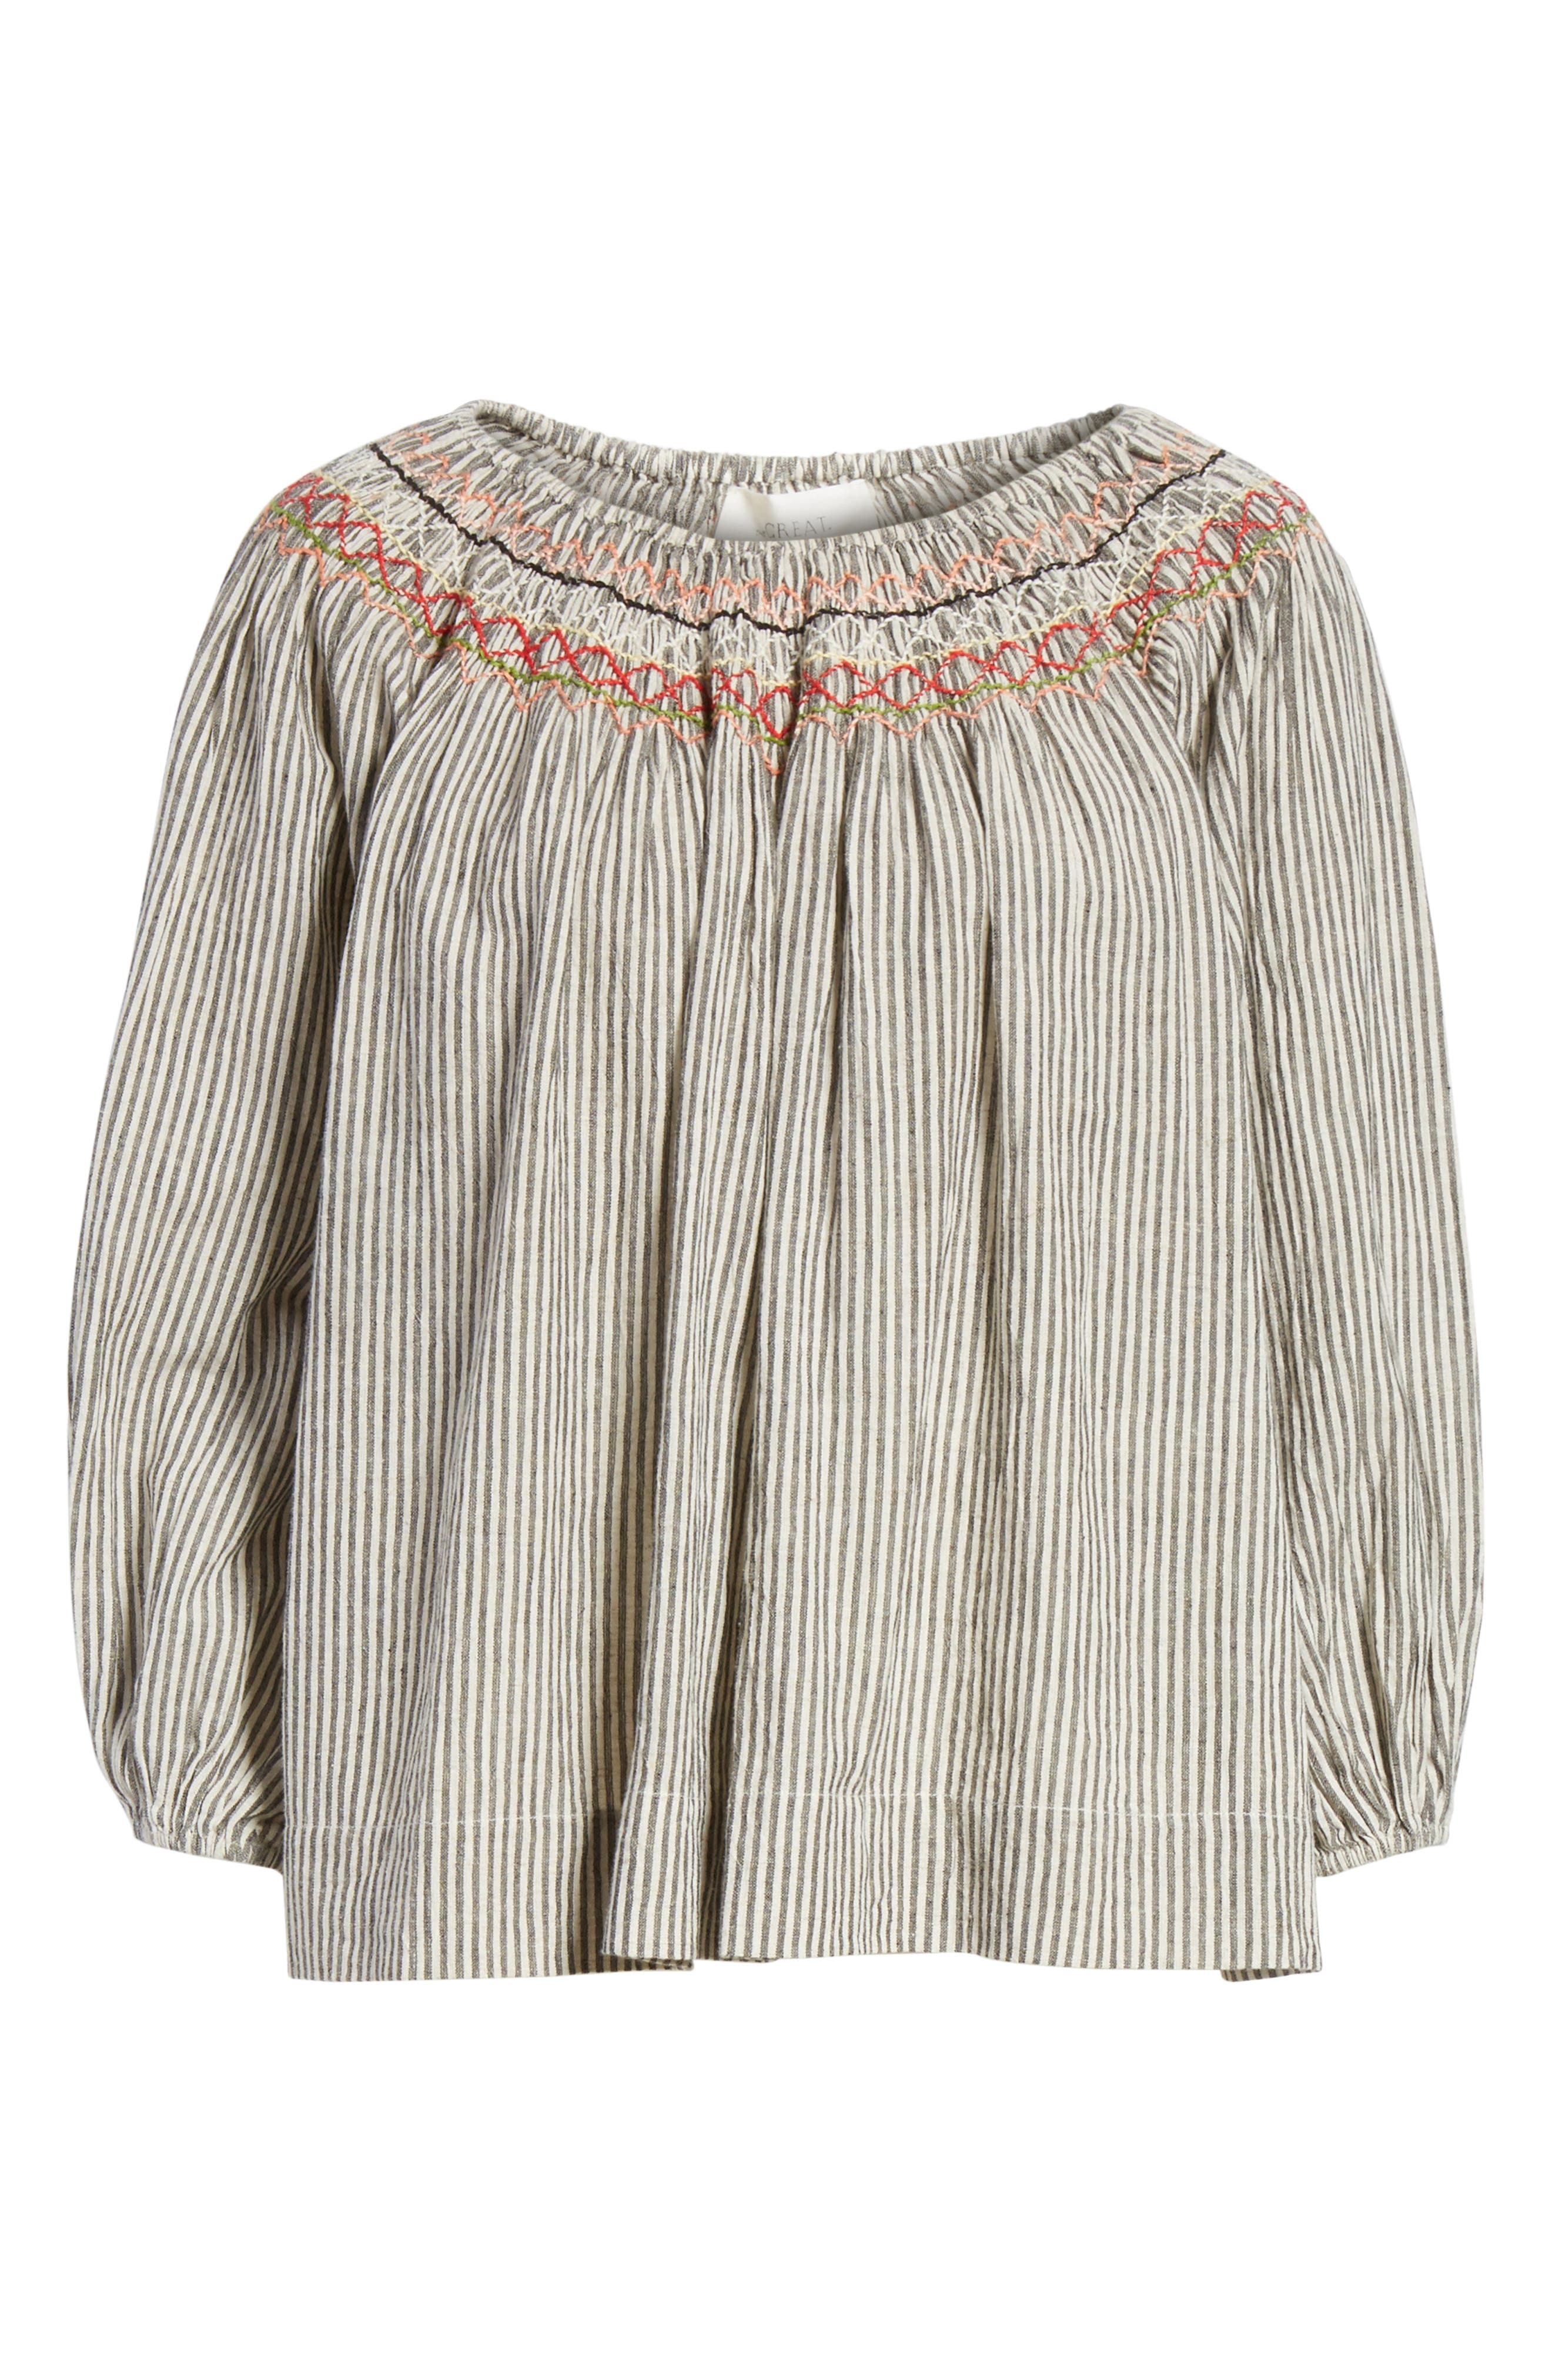 The Vista Cotton & Linen Top,                             Alternate thumbnail 6, color,                             400